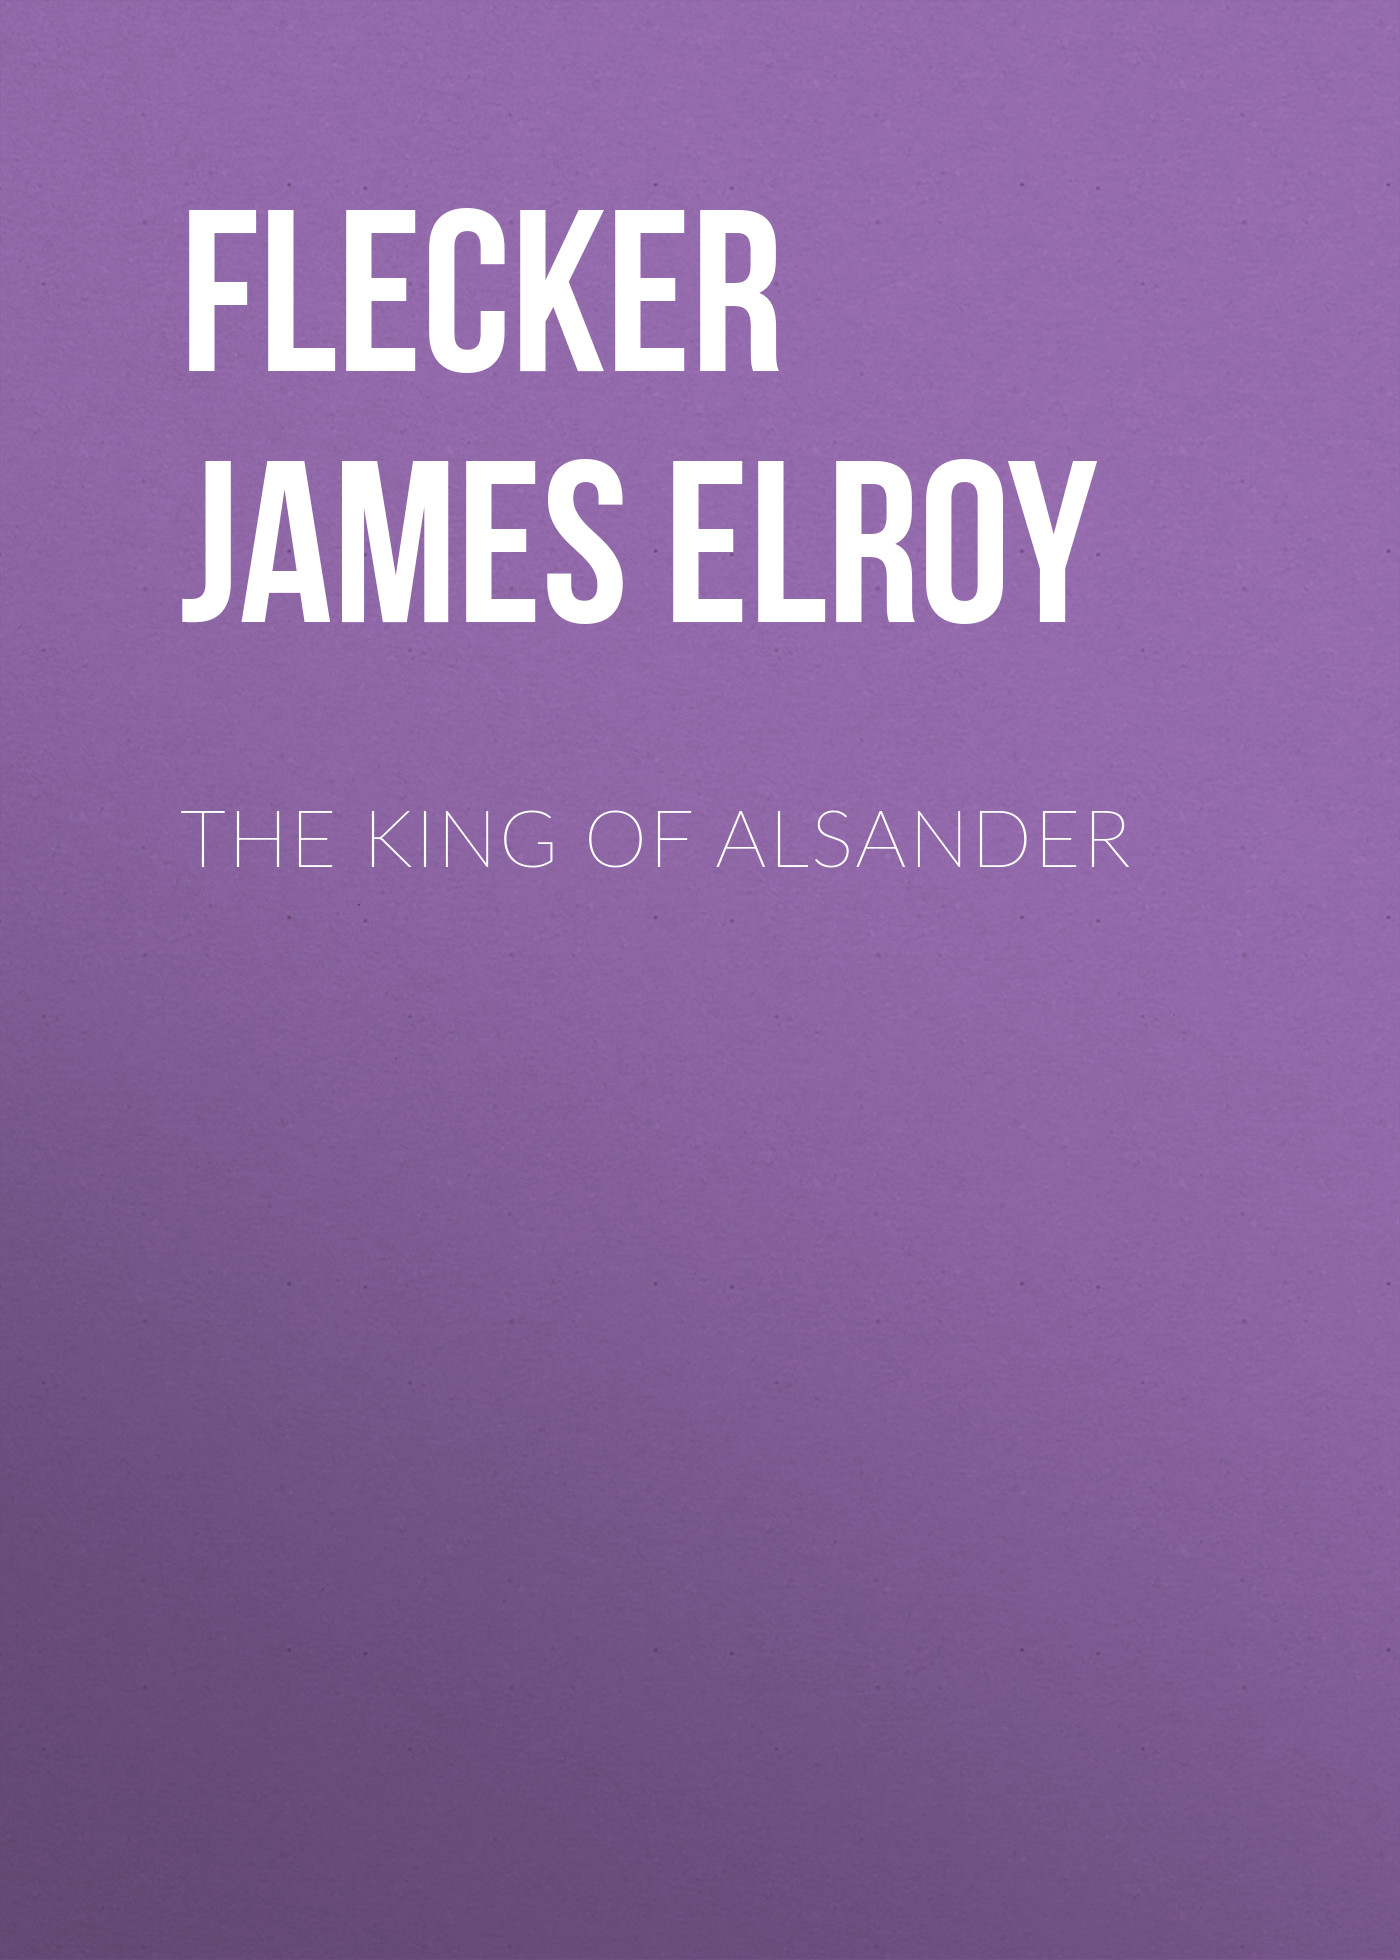 The King of Alsander